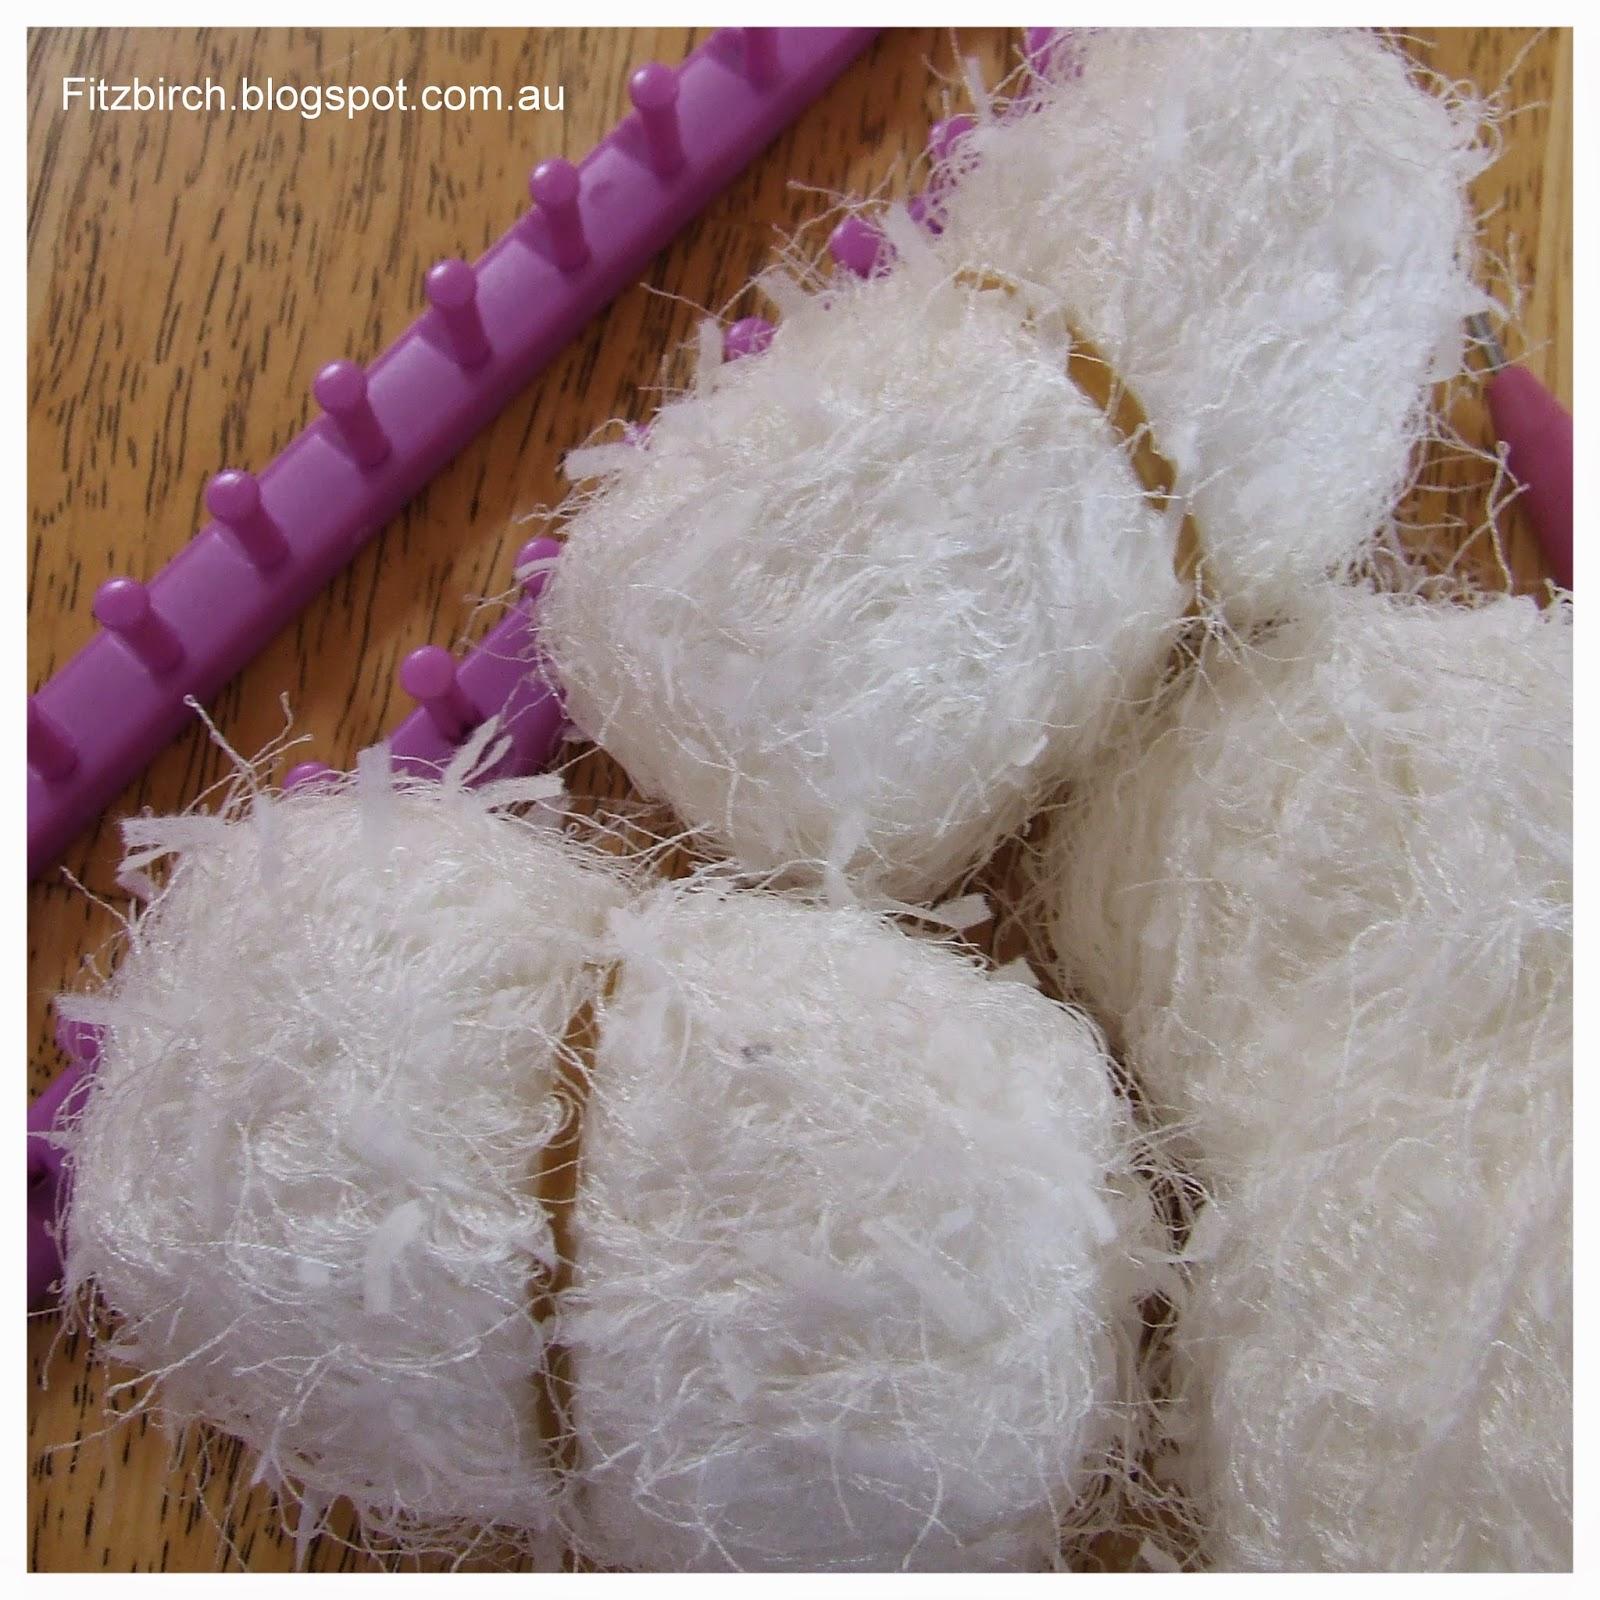 Knitting Loom Scarf Stitches : FitzBirch Crafts: Loom Knit Figure 8 Stitch Scarf